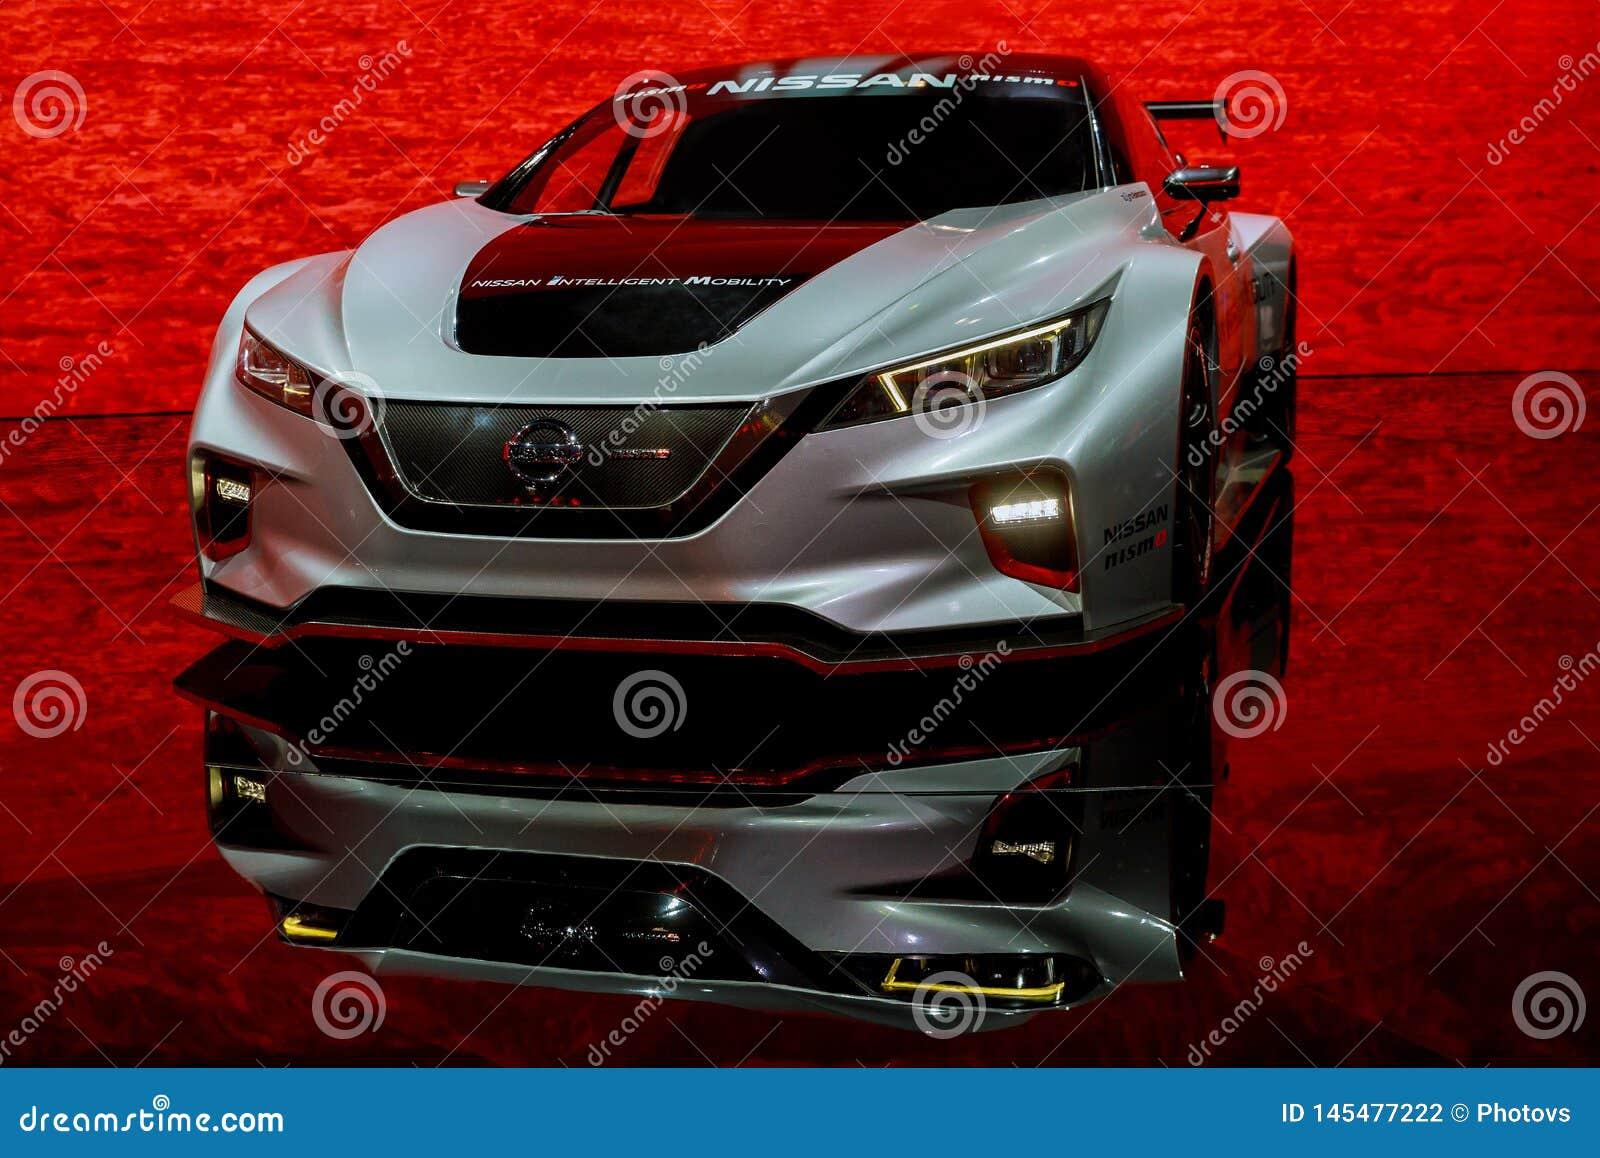 International Auto Show 2020.New York Ny Usa April 20 2019 2020 Nissan Gt R Nismo